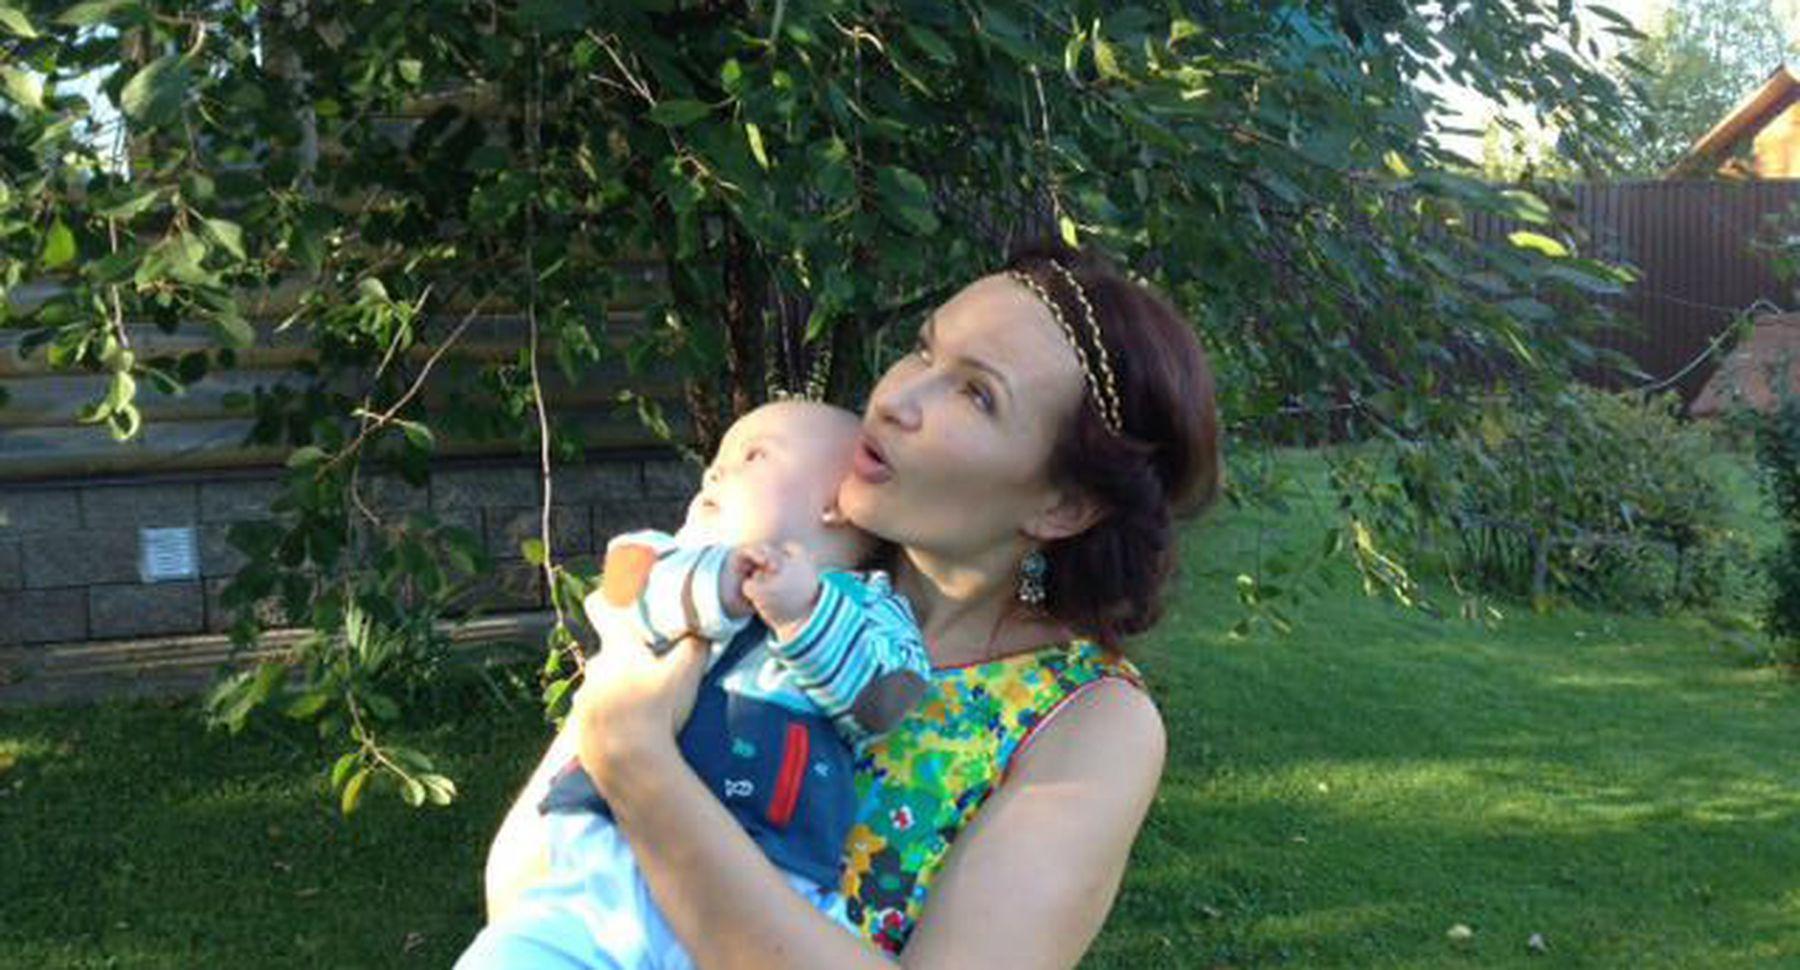 Эвелина Бледанс - биография, фото, последние новости, личная